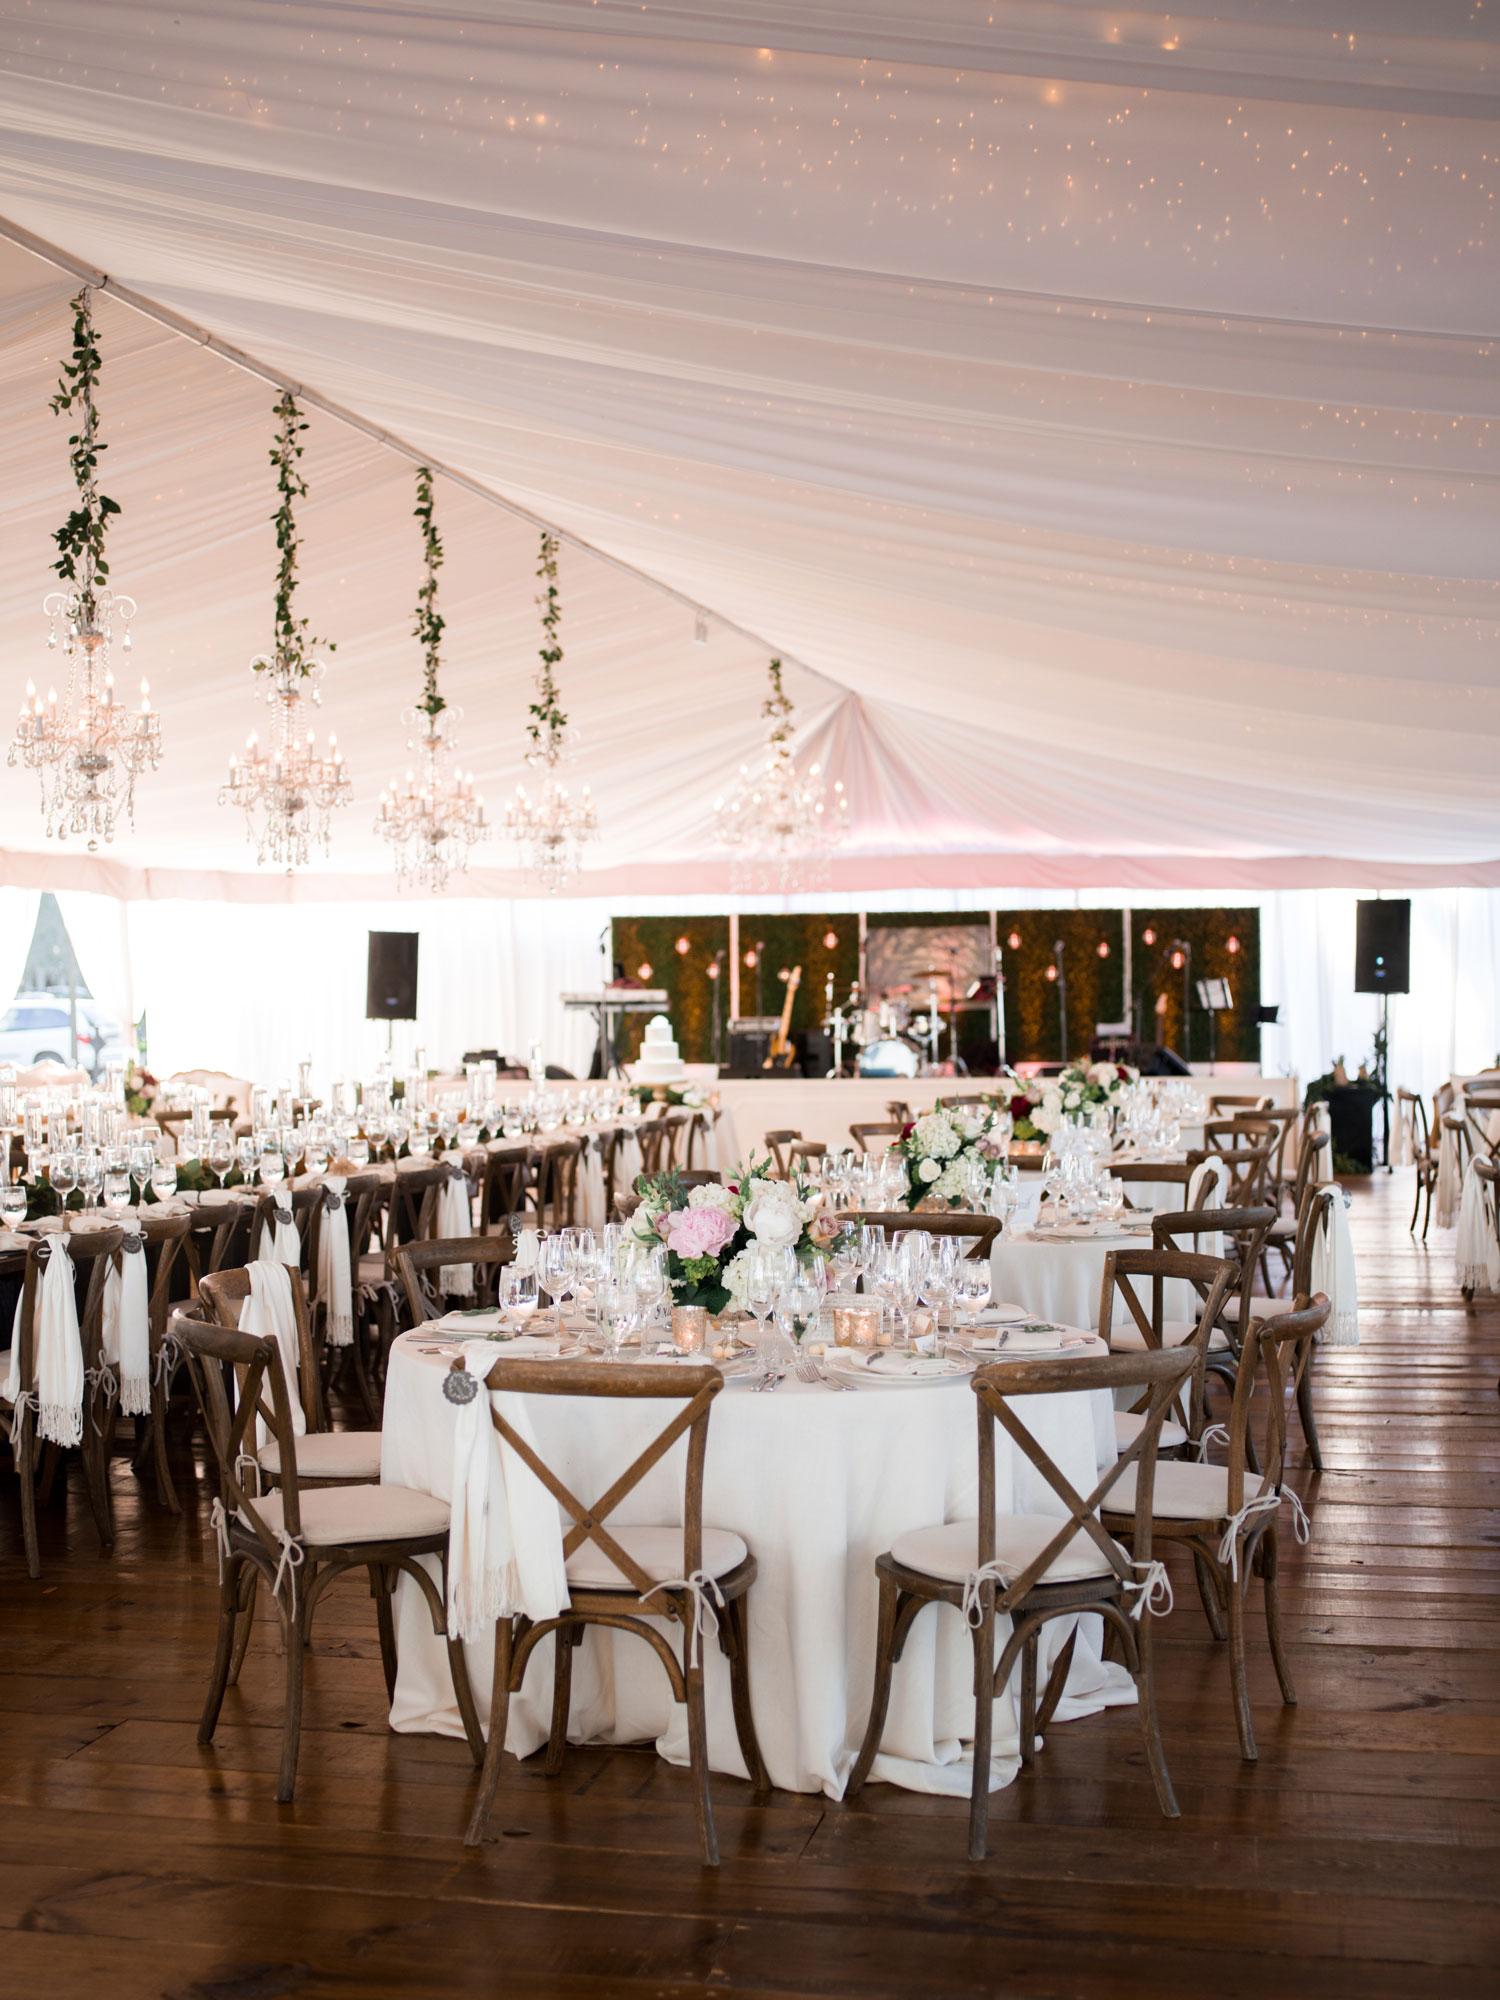 Inside Weddings Fall Winter 2017 Issue Preview rustic elegant wedding reception montage palmetto bluff kelli corn